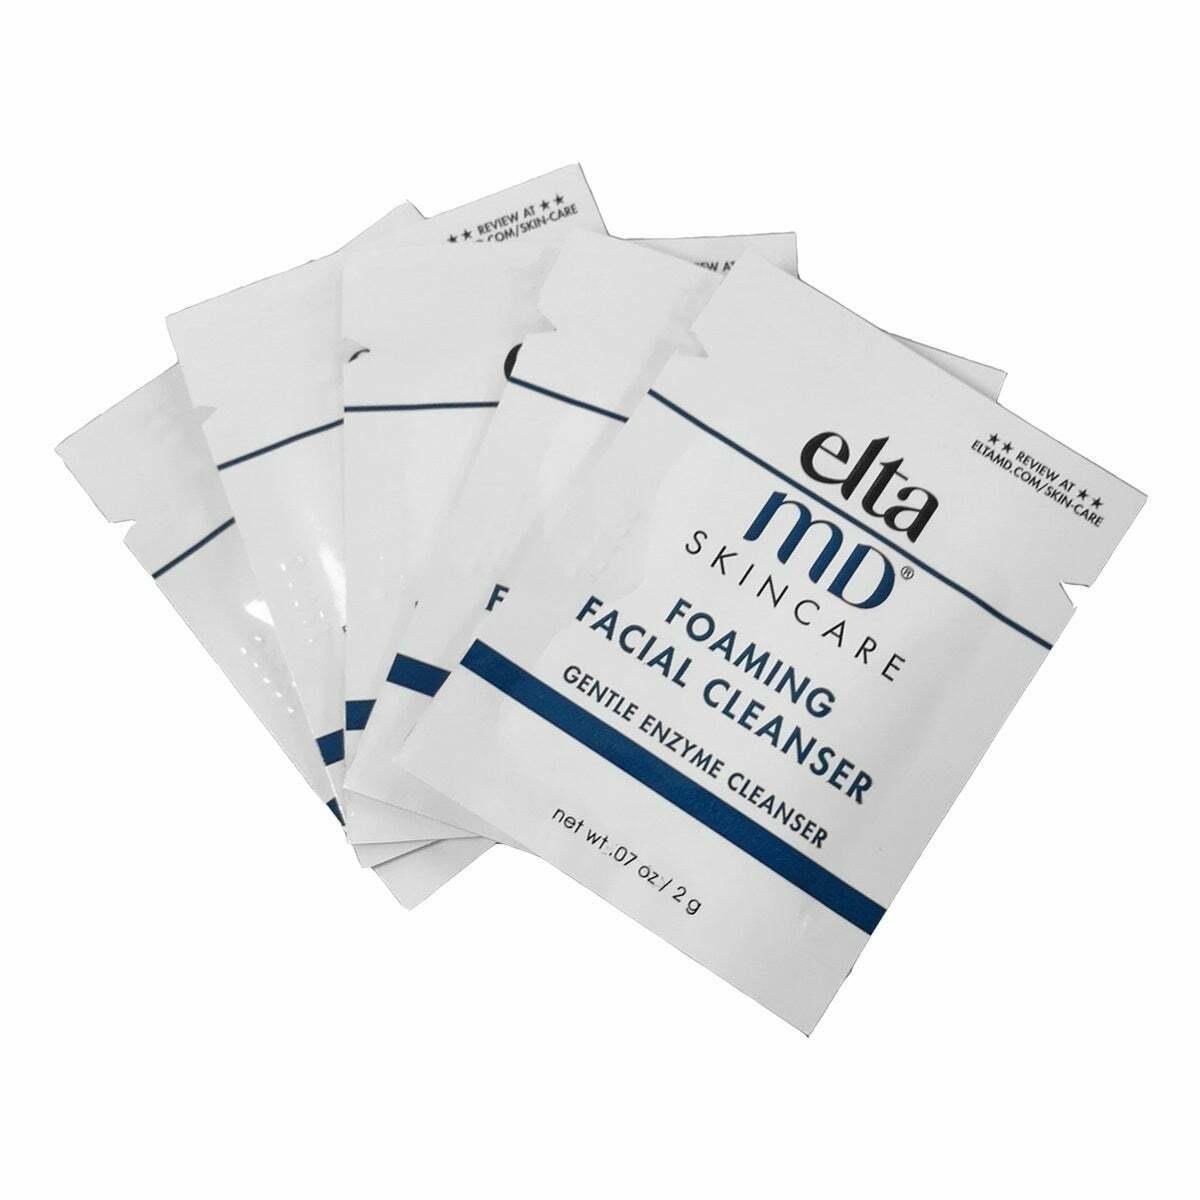 Elta md Foaming Facial Cleanser sample pack